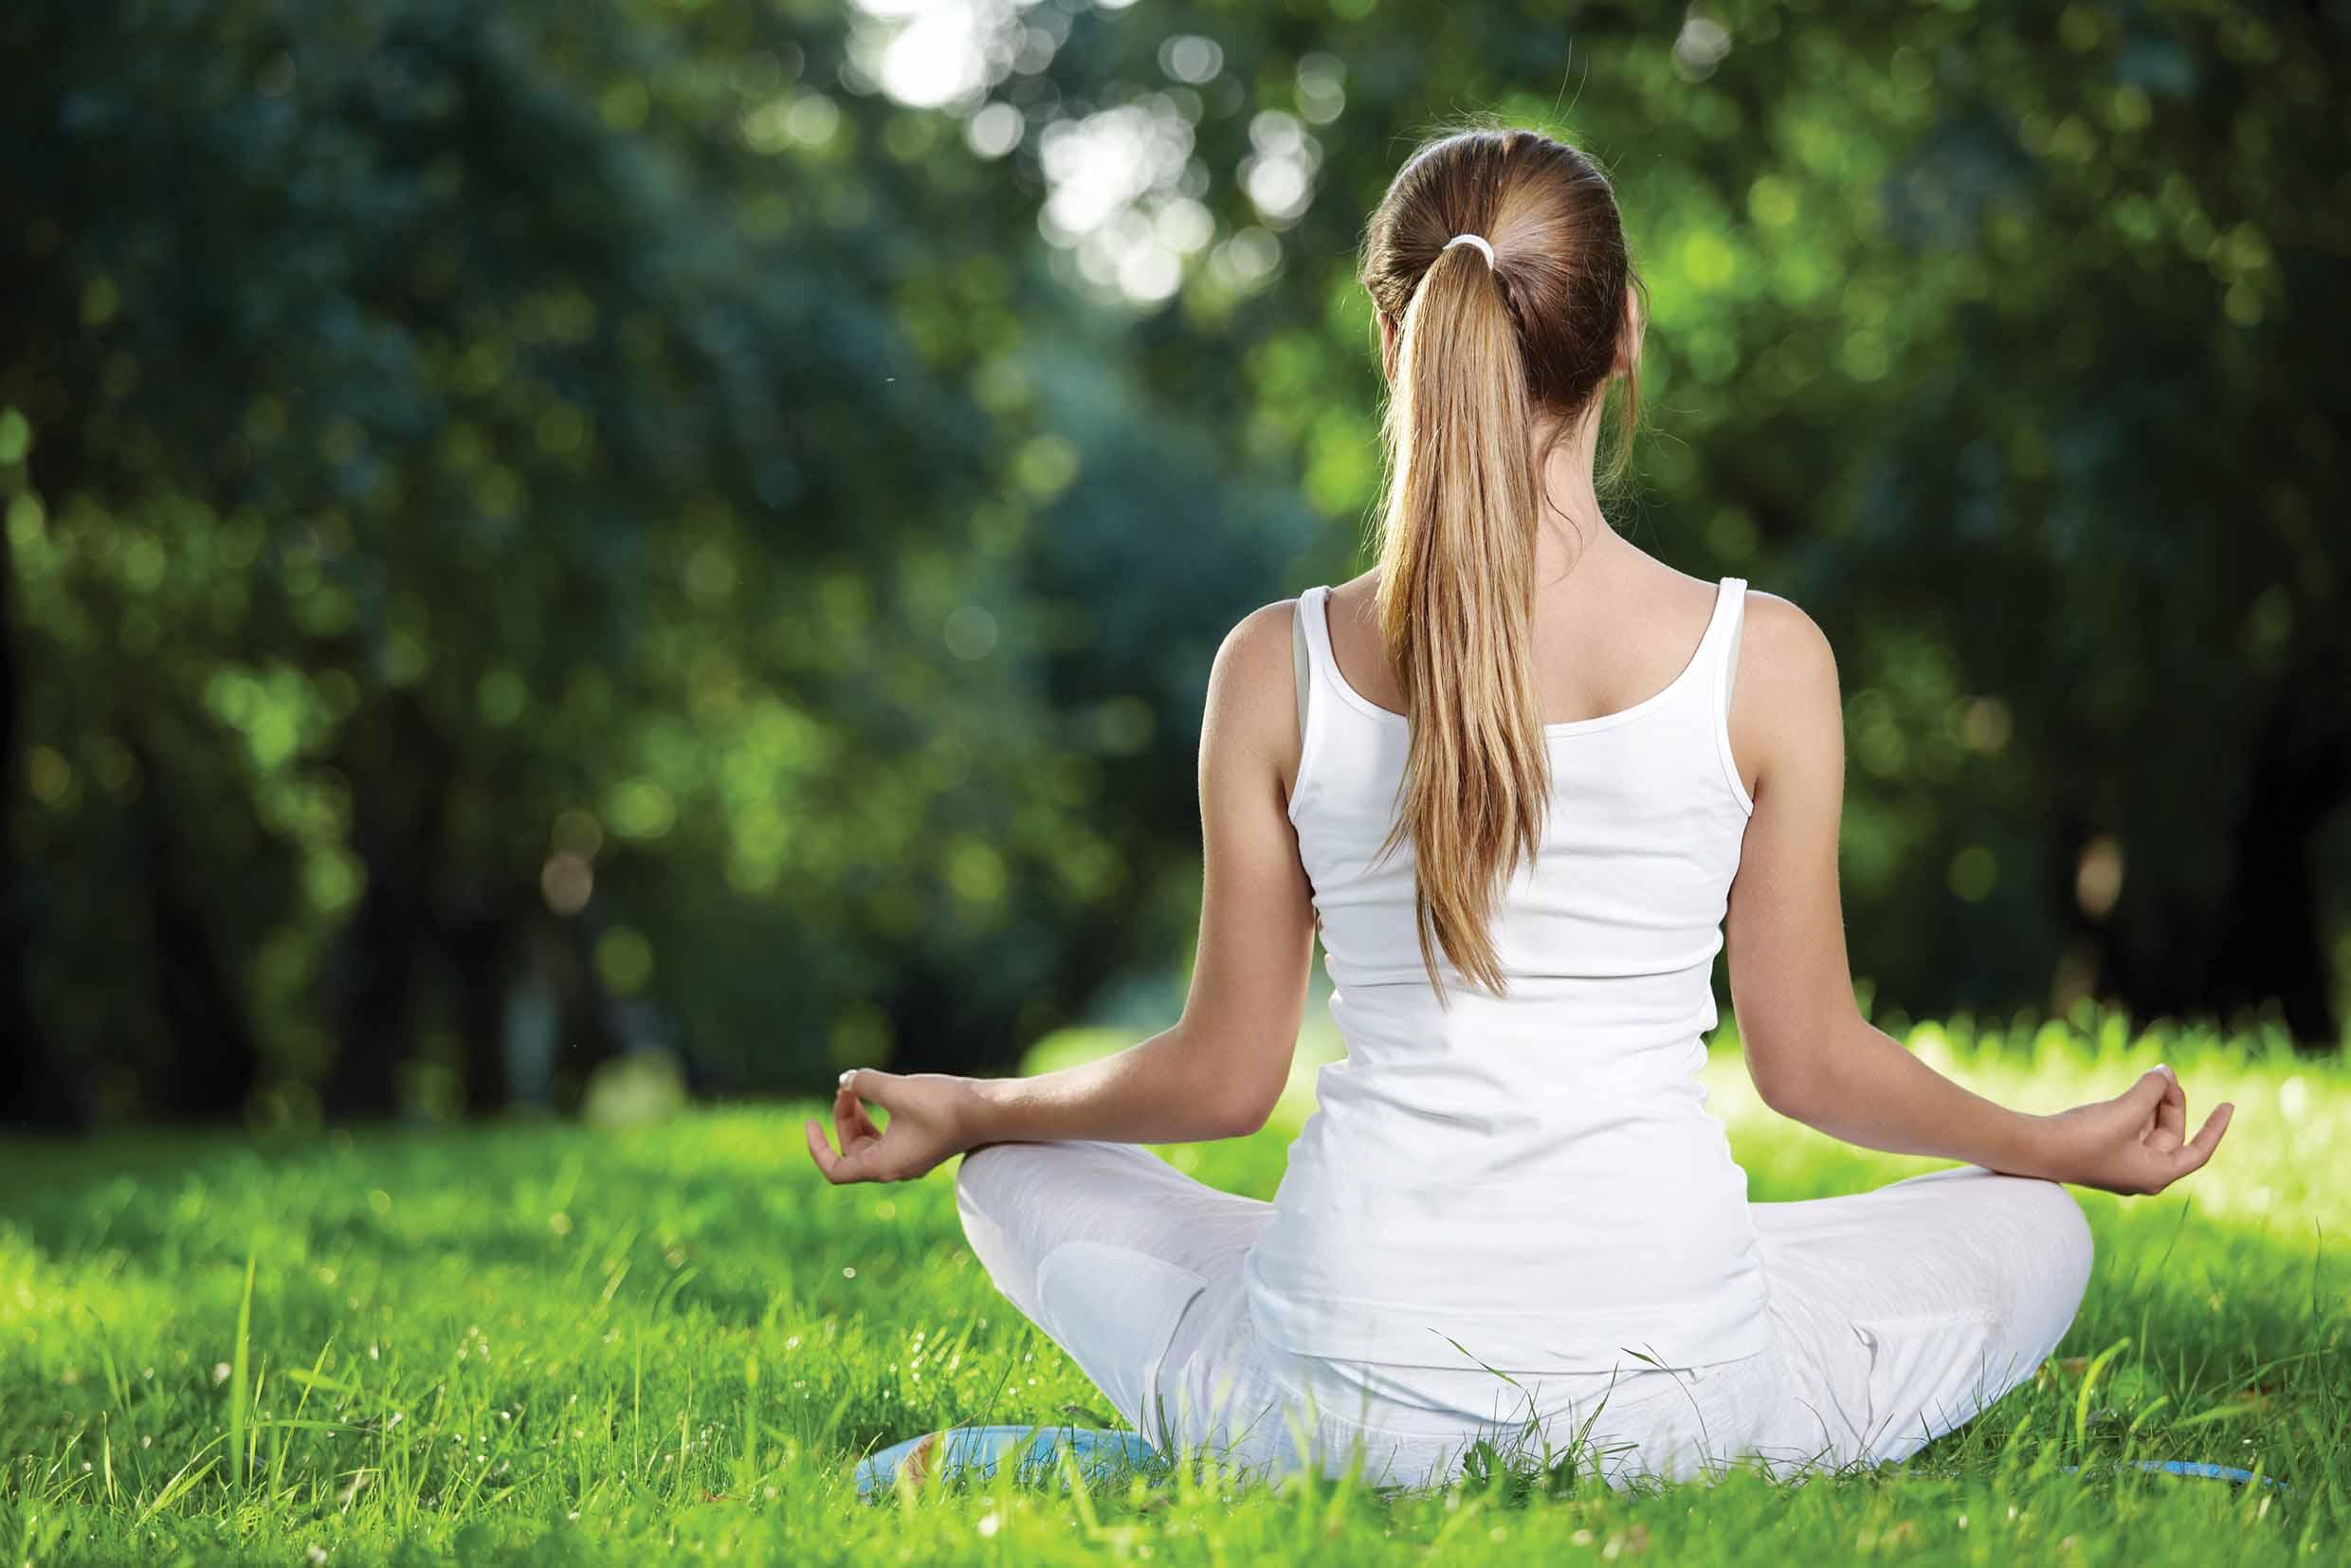 Yoga al aire libre go gu a del ocio for Jardin jardin al aire libre